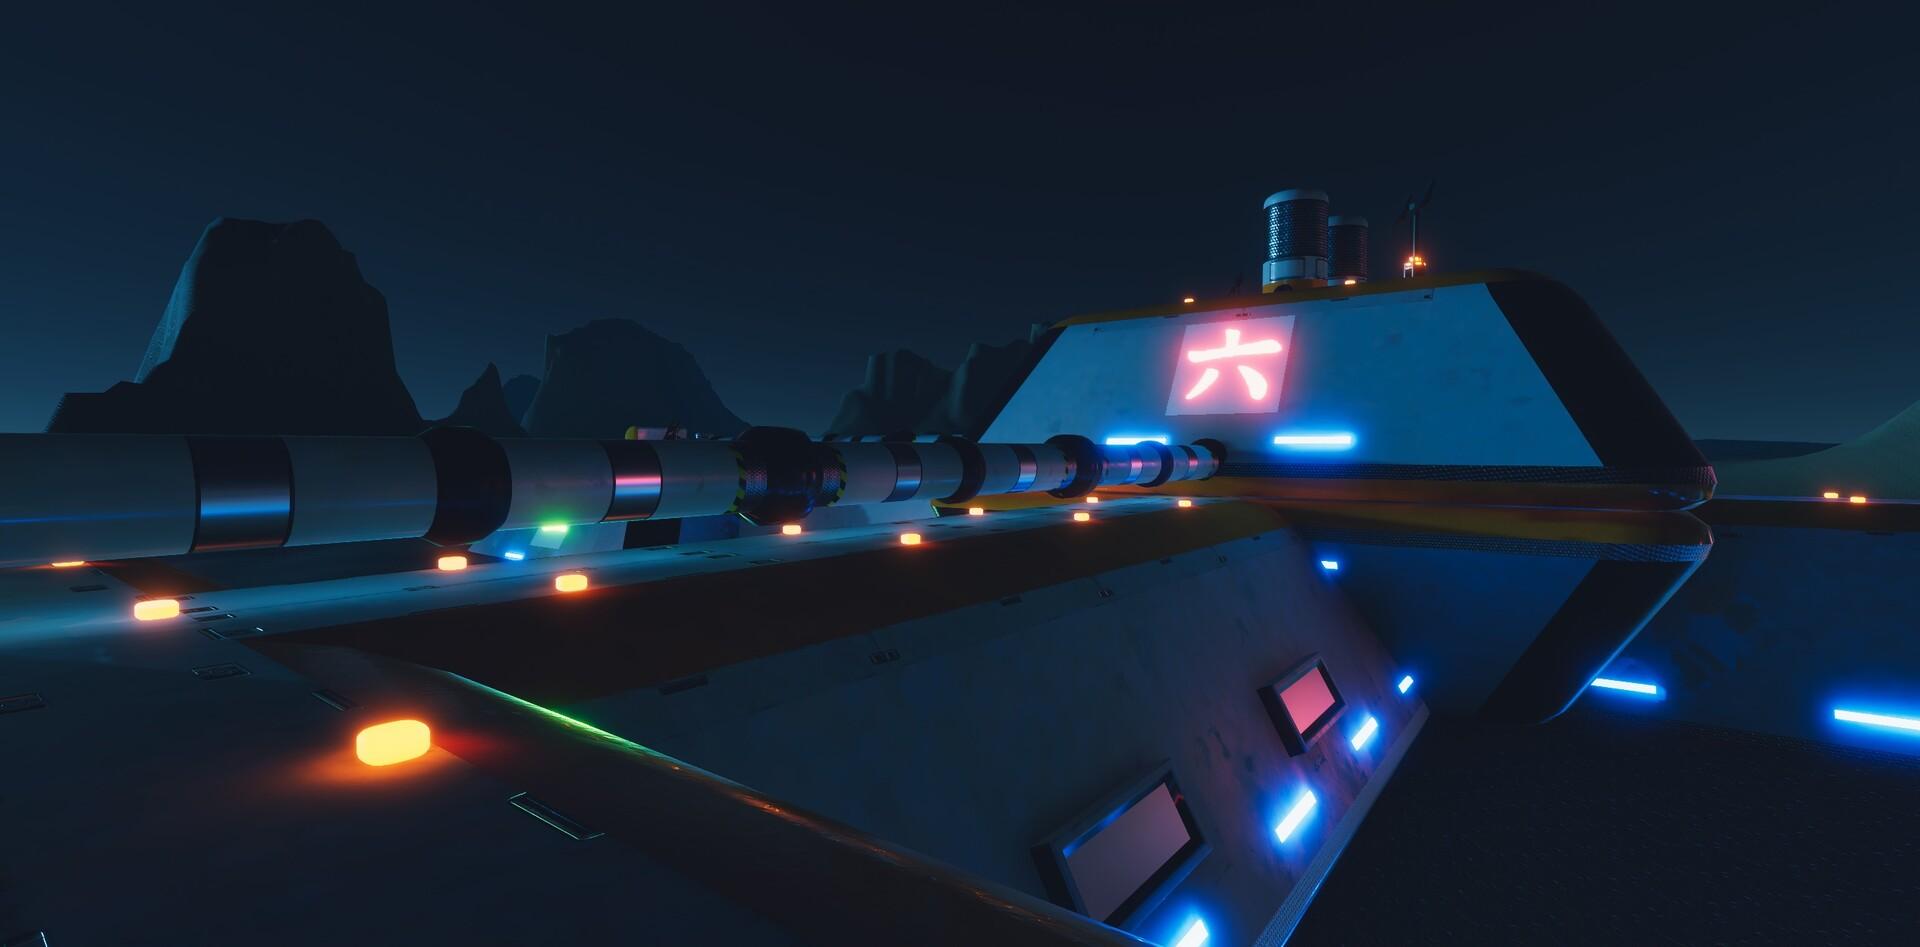 Enrico ottonello screenshot06 sci fi building exterior pack gameartifact